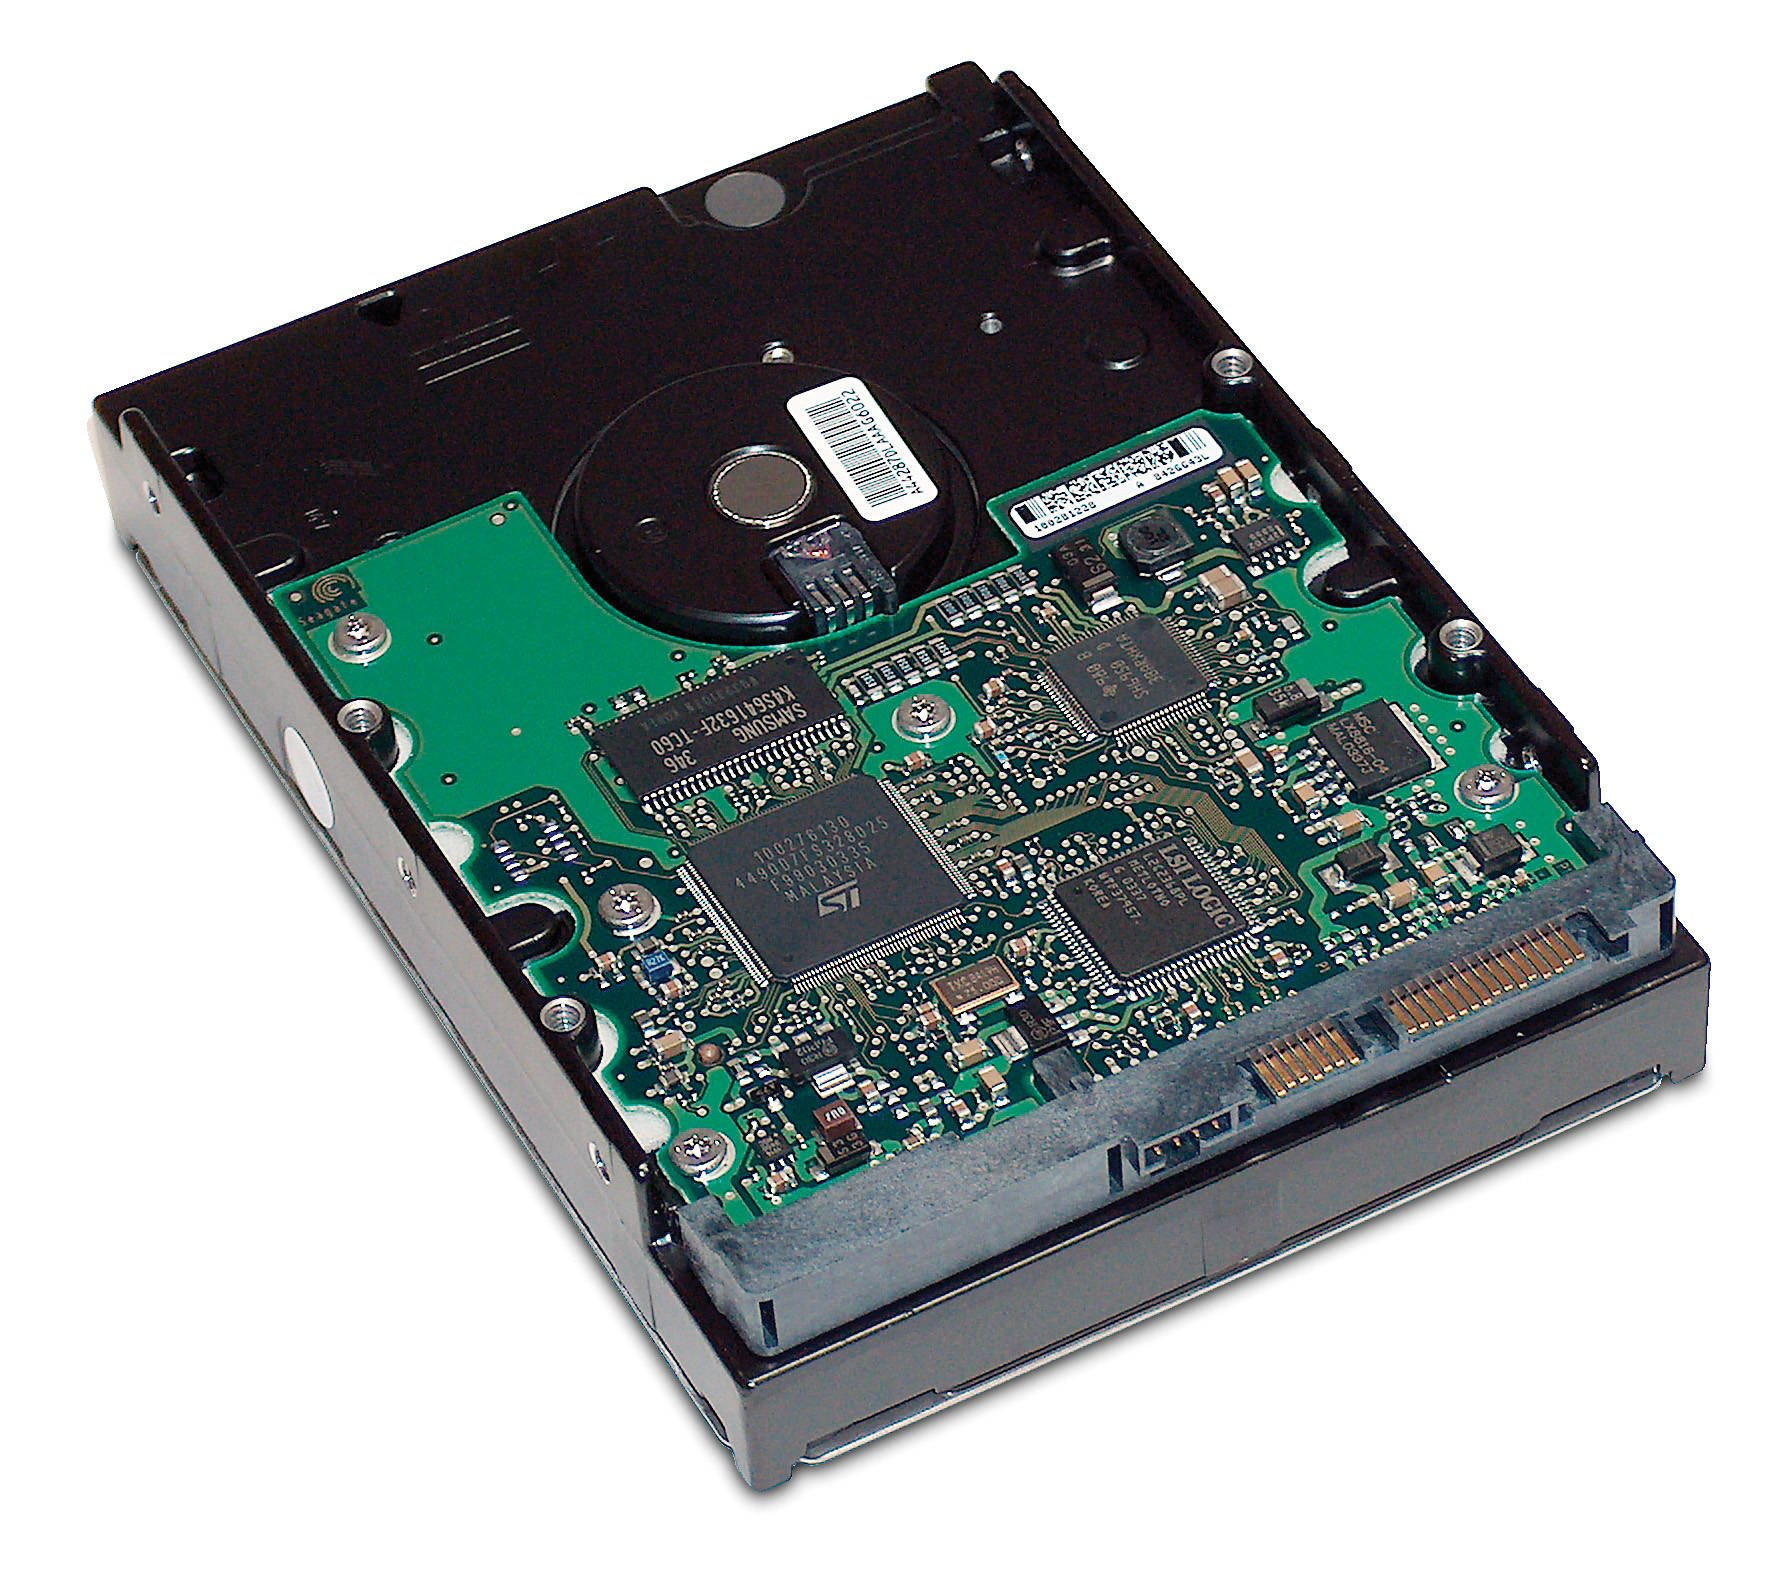 HP 1-Inch 2000 GB Hot-Swap 2 MB Cache Internal Hard Drive QB576AT